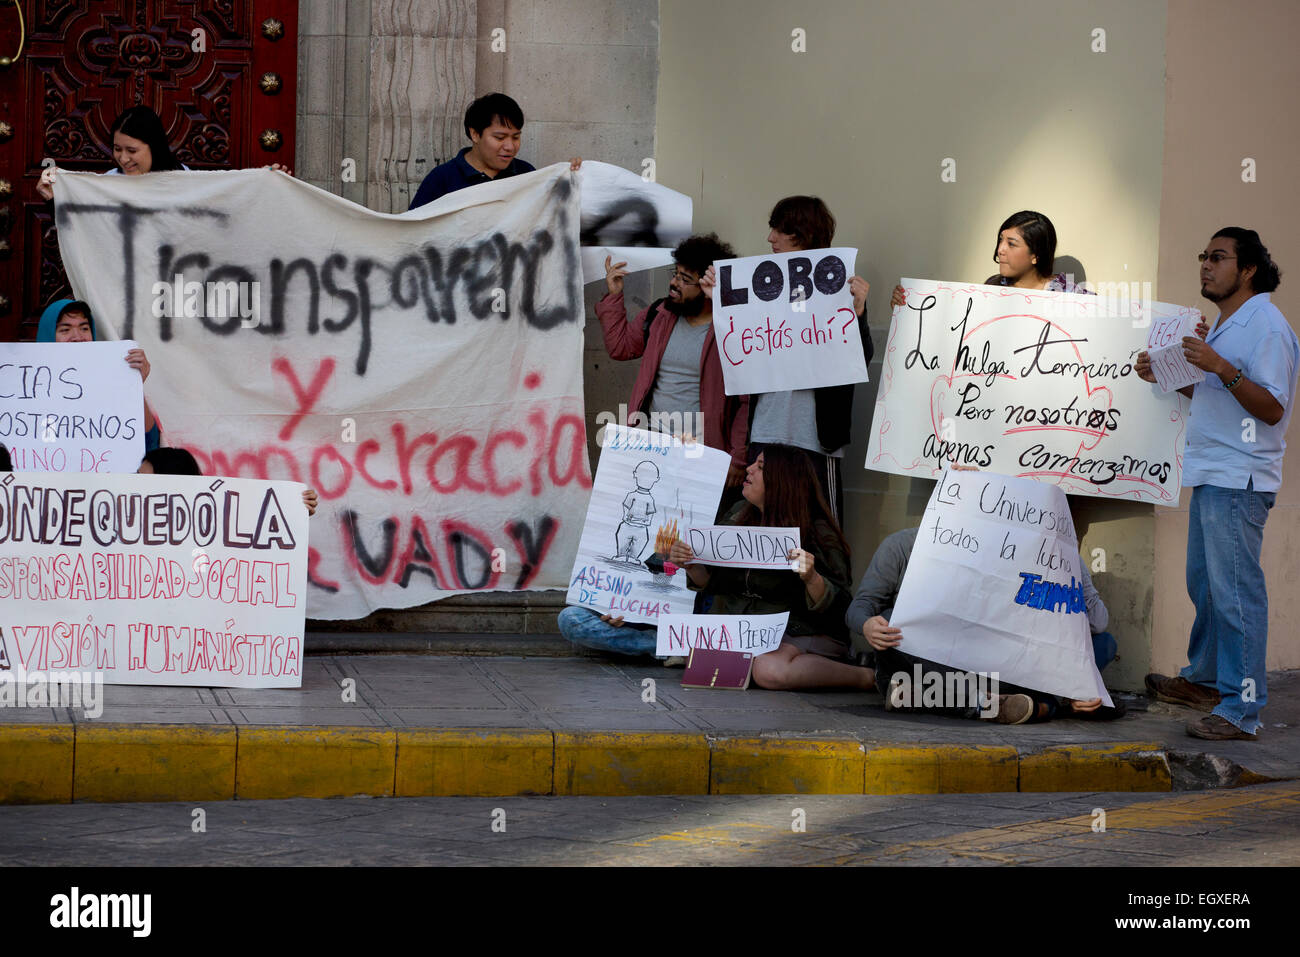 Universität Studentendemonstration, Merida, Yucatan, Mexiko Stockbild